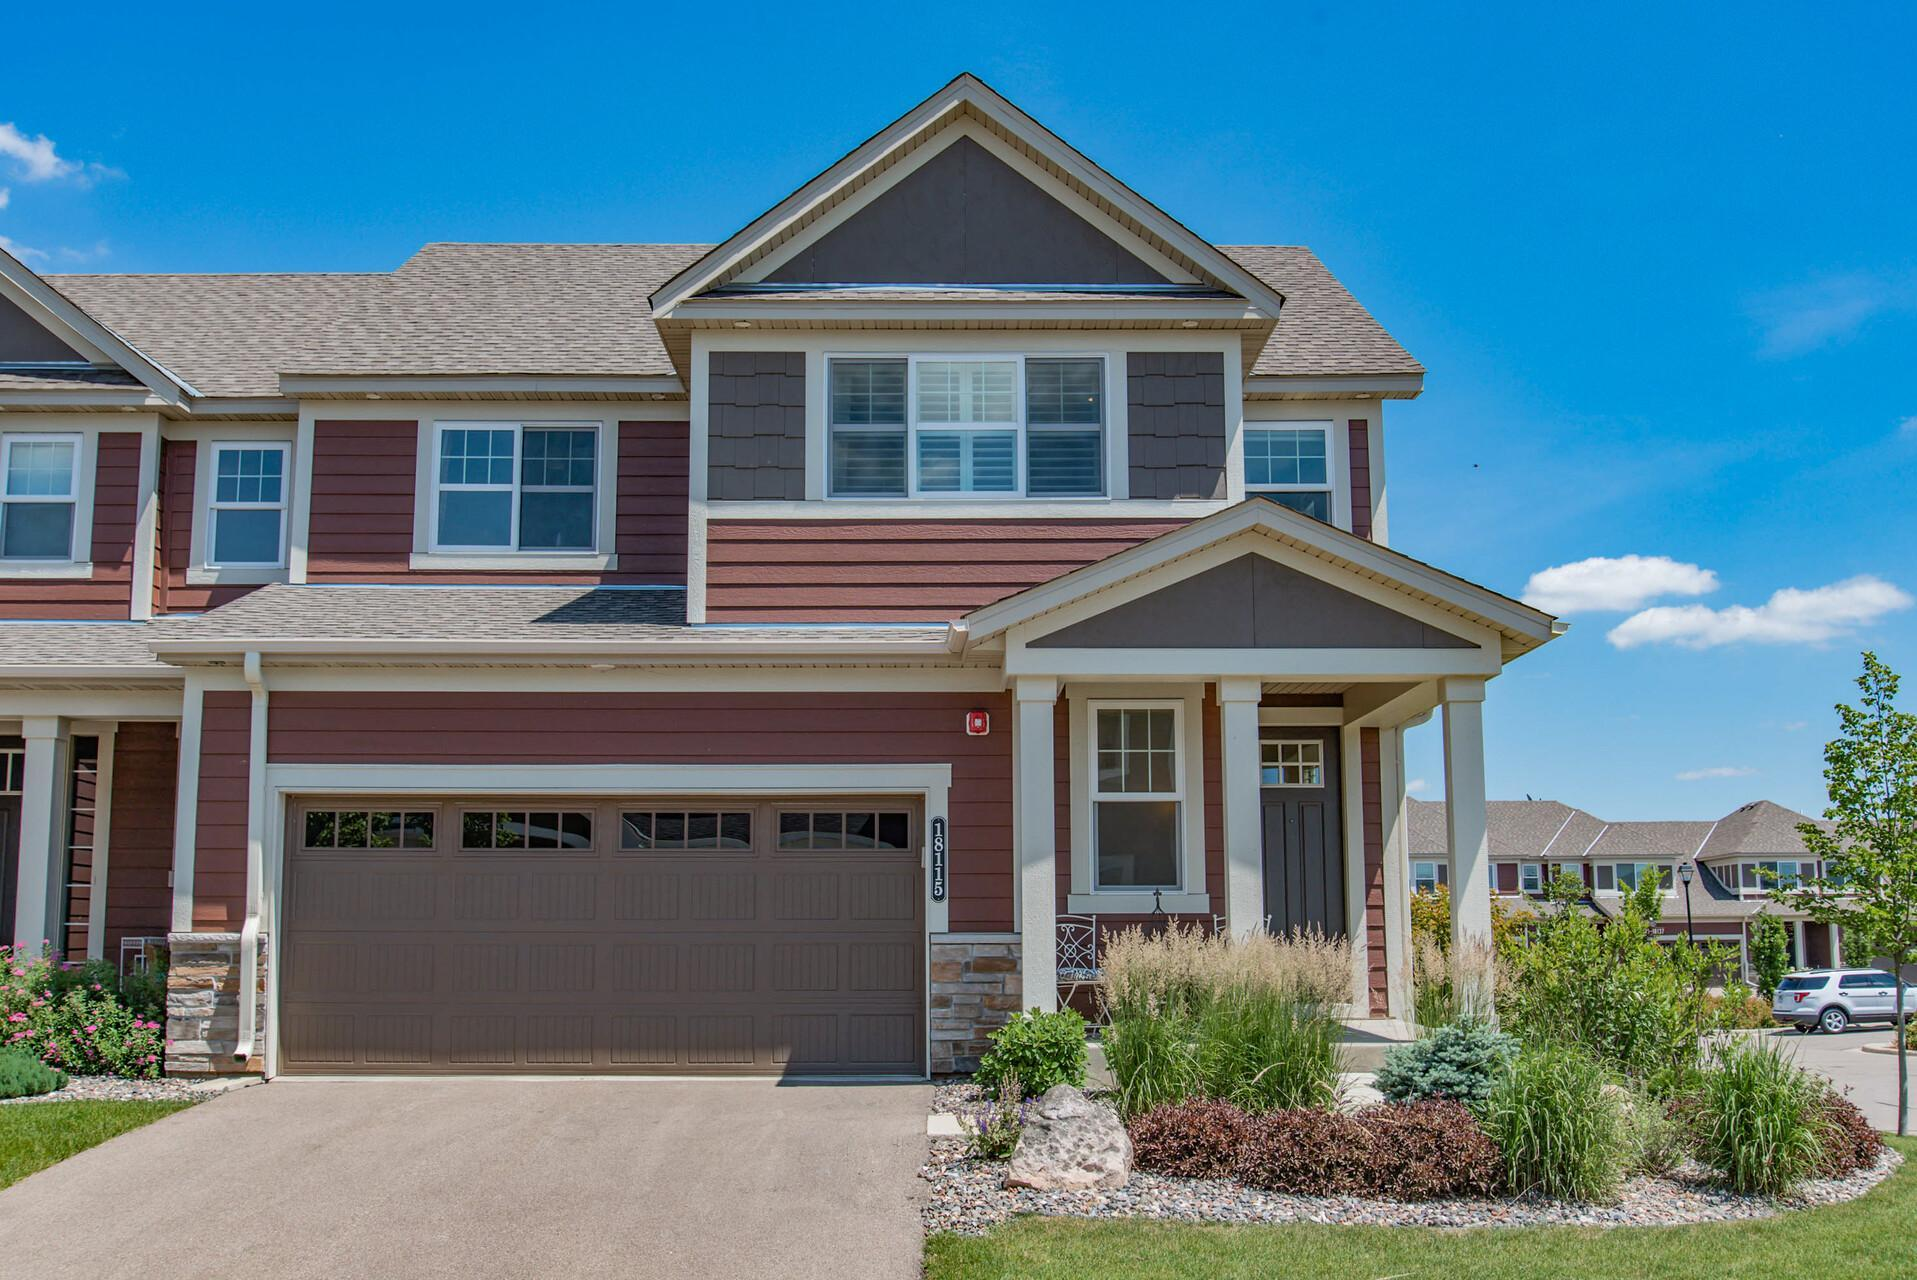 18115 Glassfern Property Photo - Lakeville, MN real estate listing